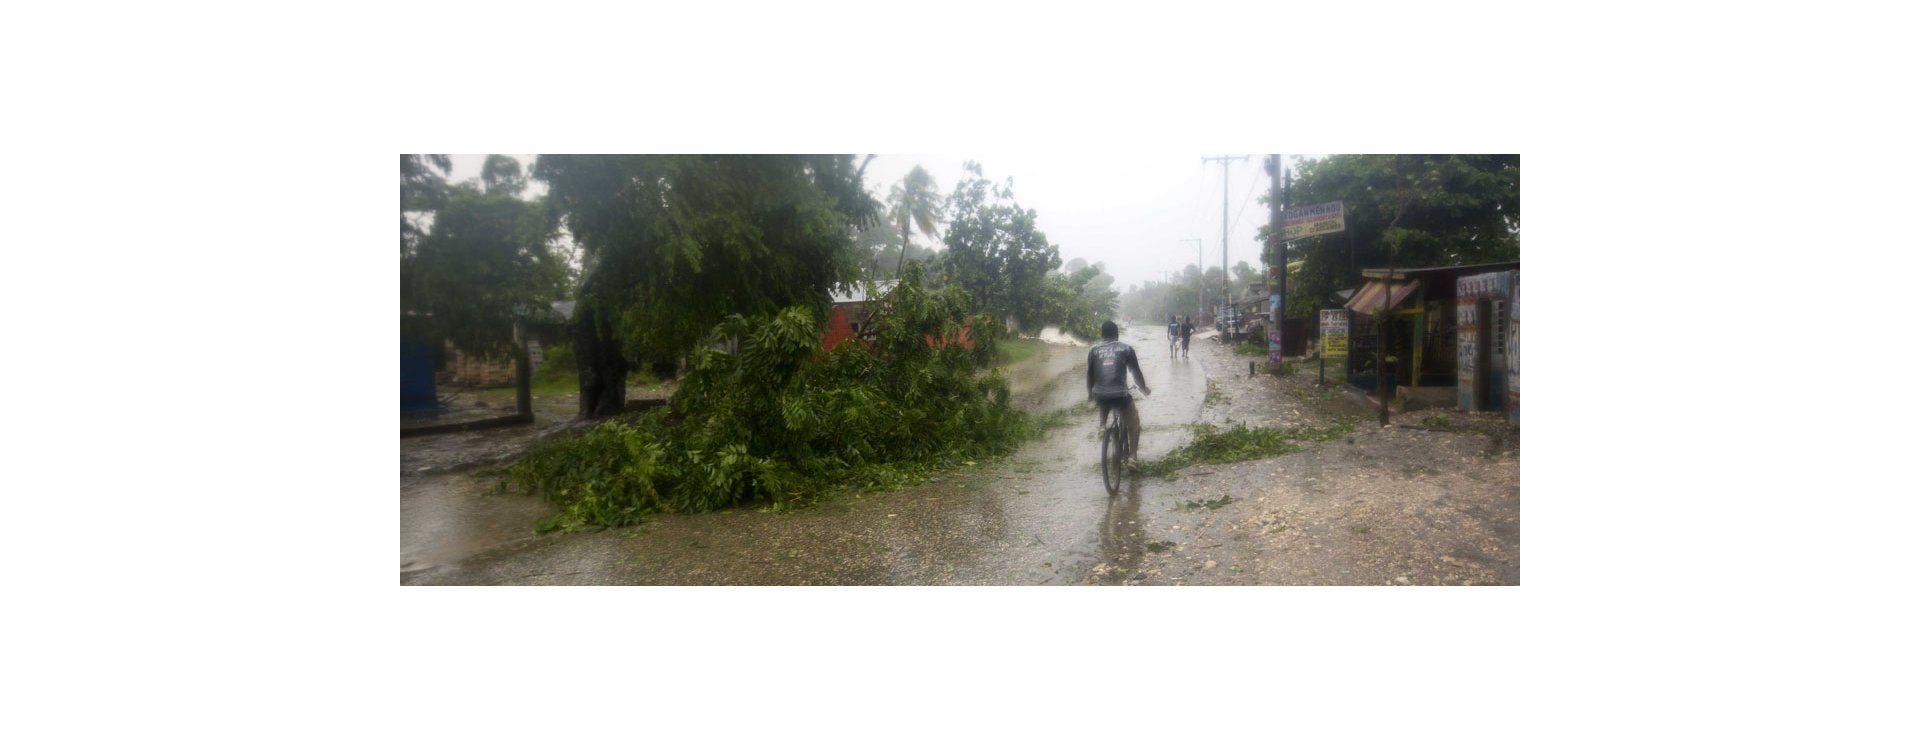 El huracán Matthew, la tormenta más poderosa que golpea el Caribe en casi una década